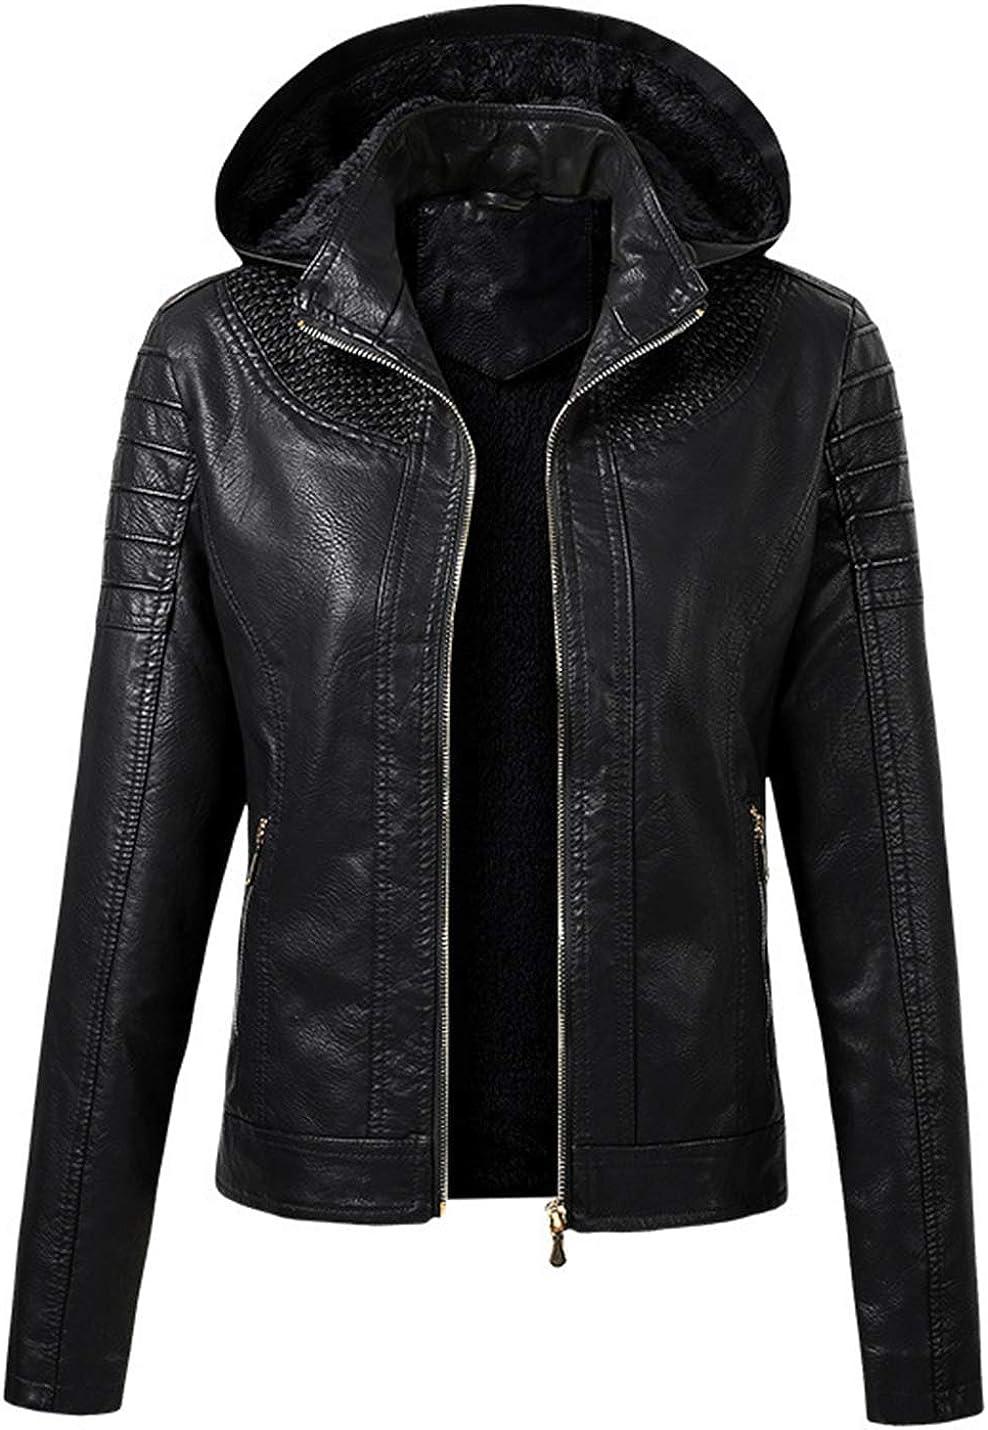 PAODIKUAI Women's Fleece Lined Sherpa Faux Leather Jacket with Removable Hood